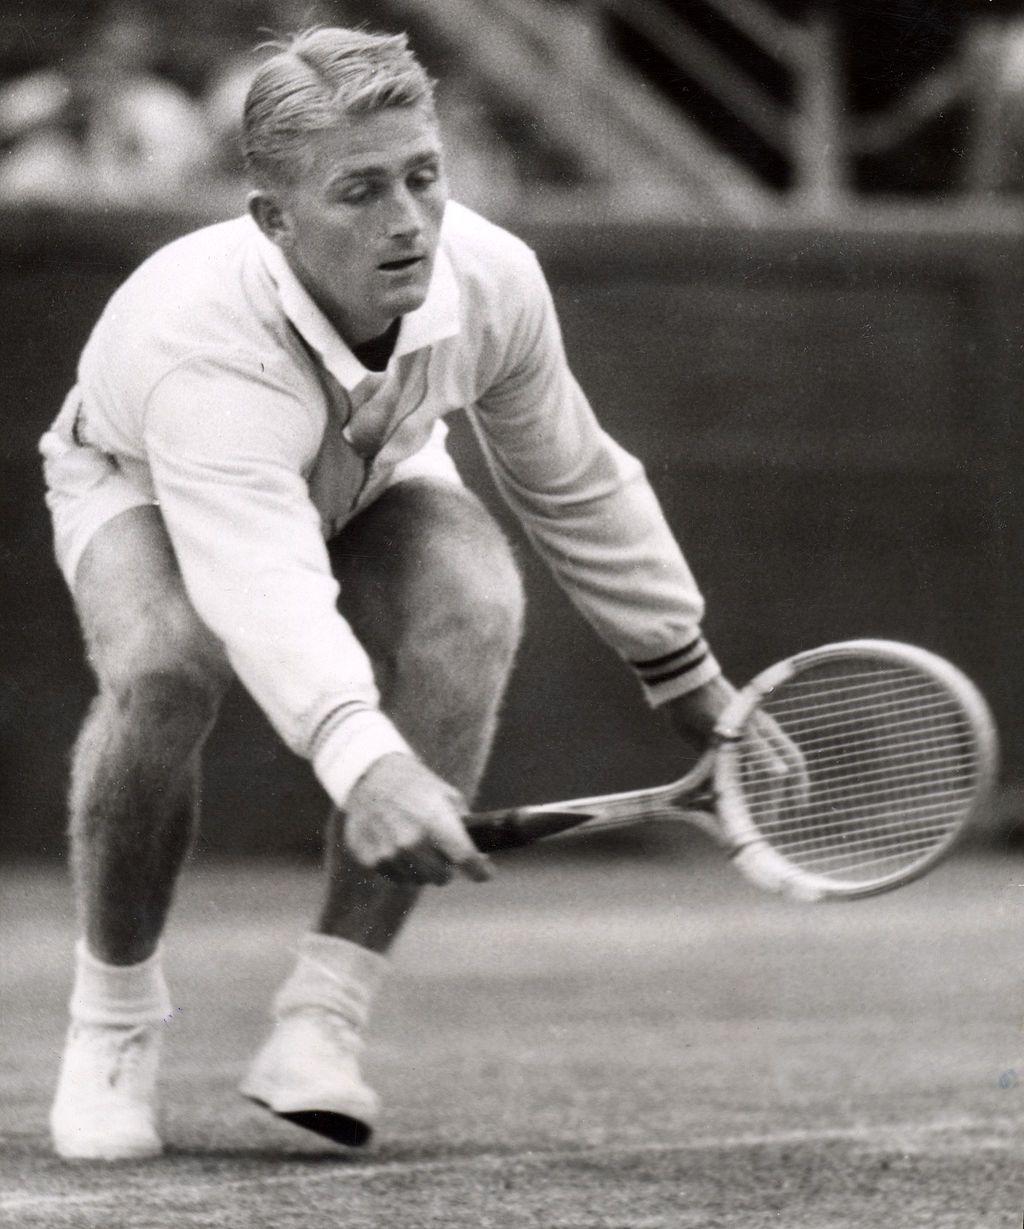 Lew Hoad Australian 1954 Davis Cup Match at the Kooyong Lawn